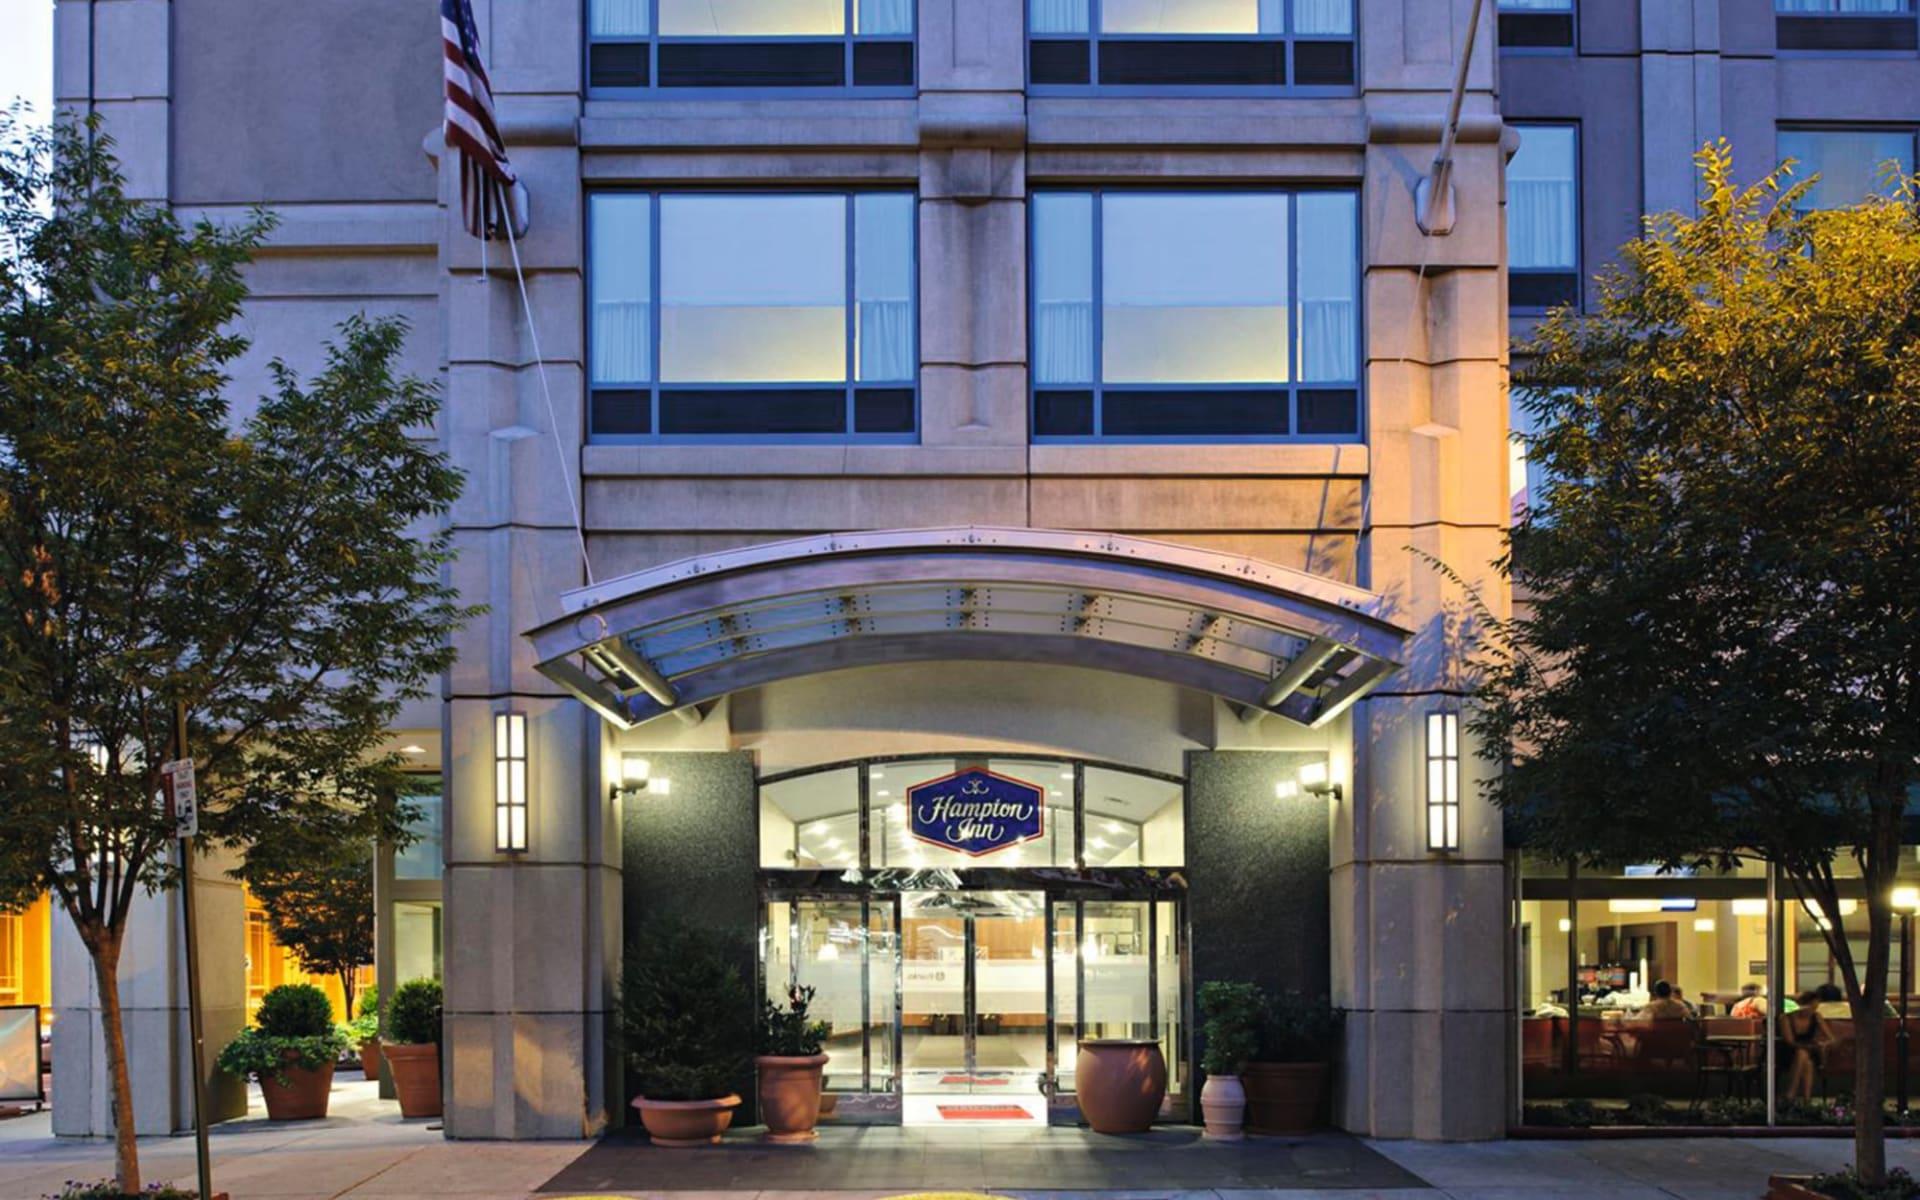 Hampton Inn Center City in Philadelphia:  Exterior_Hampton Inn Philadelphia Conv.Ctr_Hilton